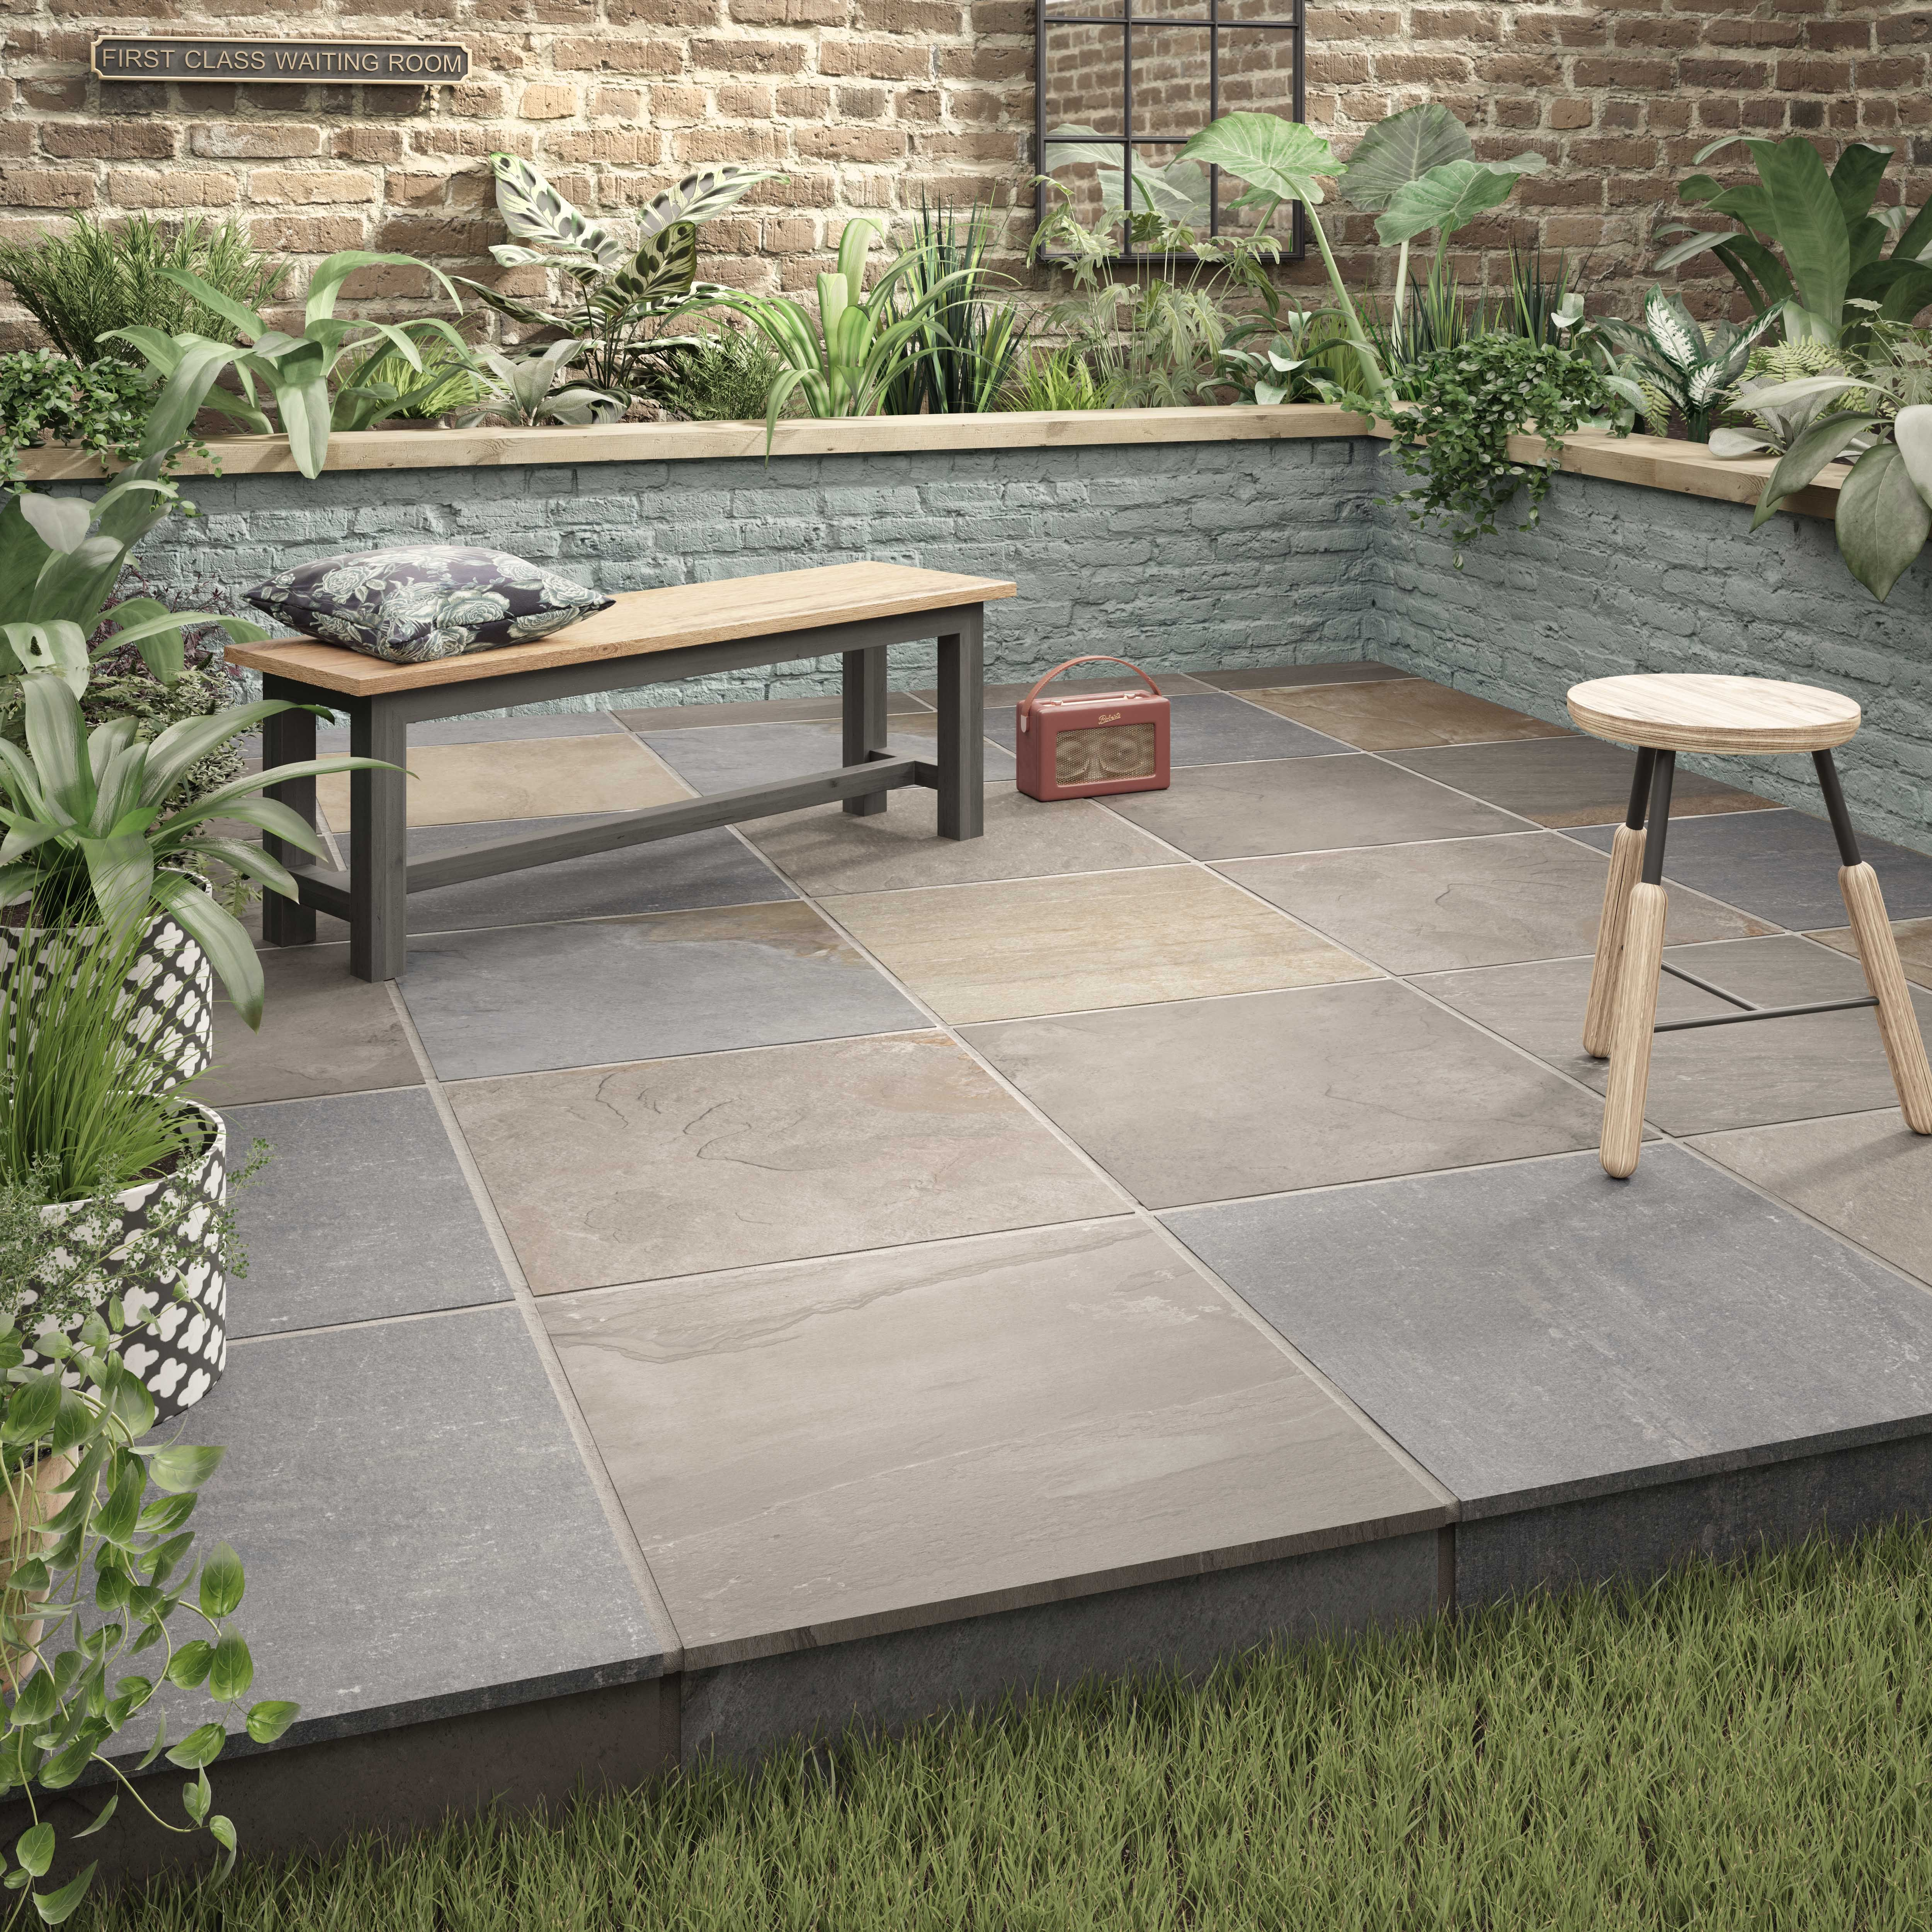 Newby Grey Multi 600x600mm In 2020 Outdoor Porcelain Tile Outdoor Tile Patio Patio Tiles